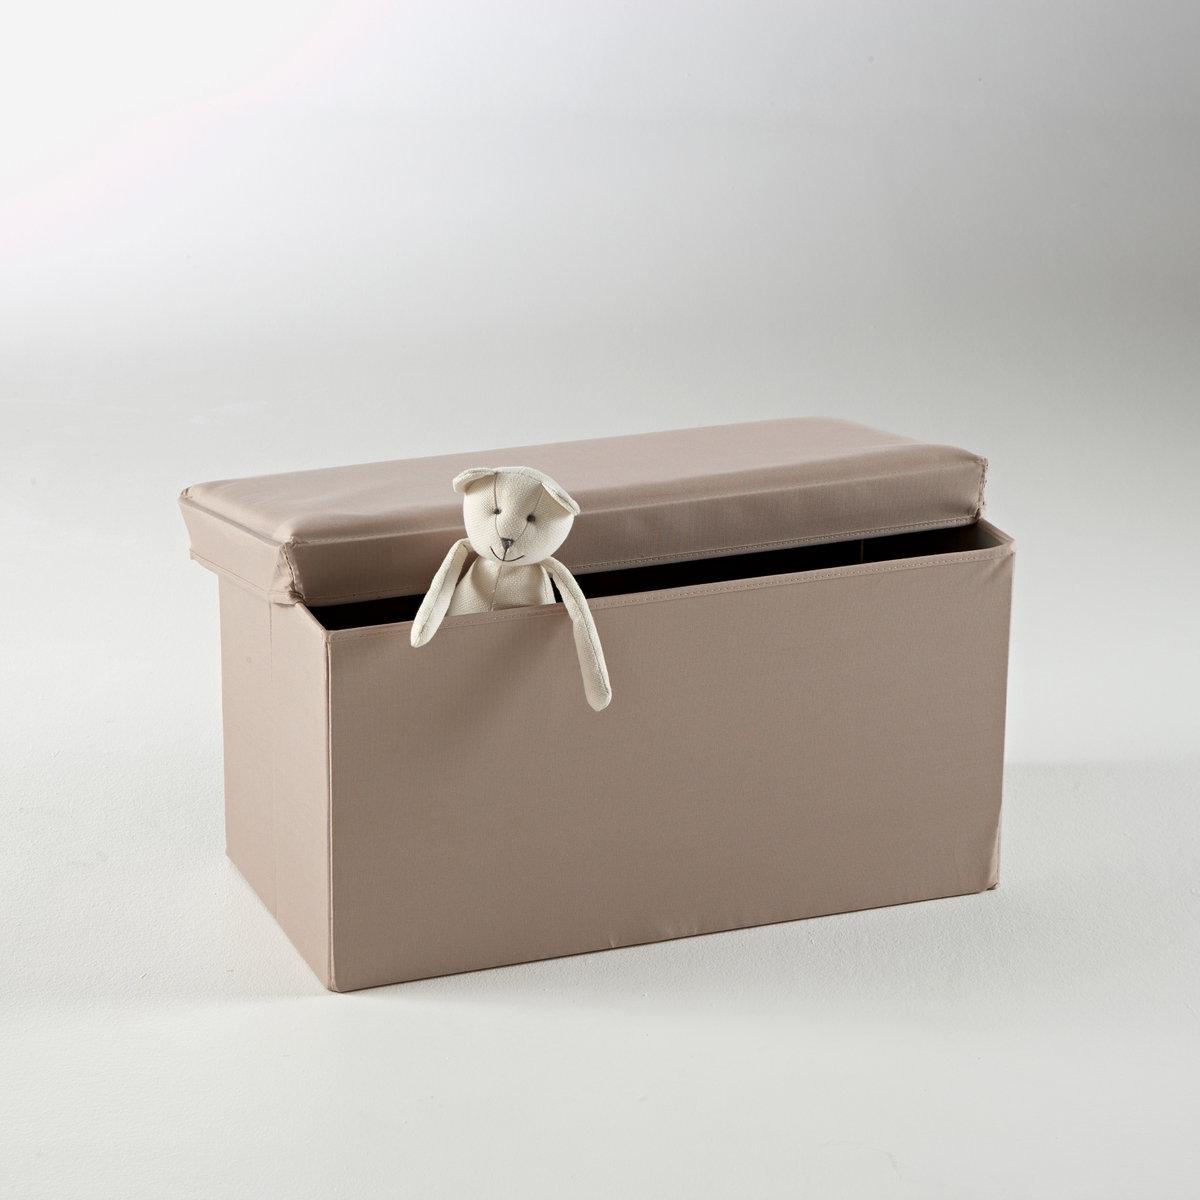 Пуф для хранения складной товары для хранения dorabeads 27 0 x 20 0 5 2015 b82865